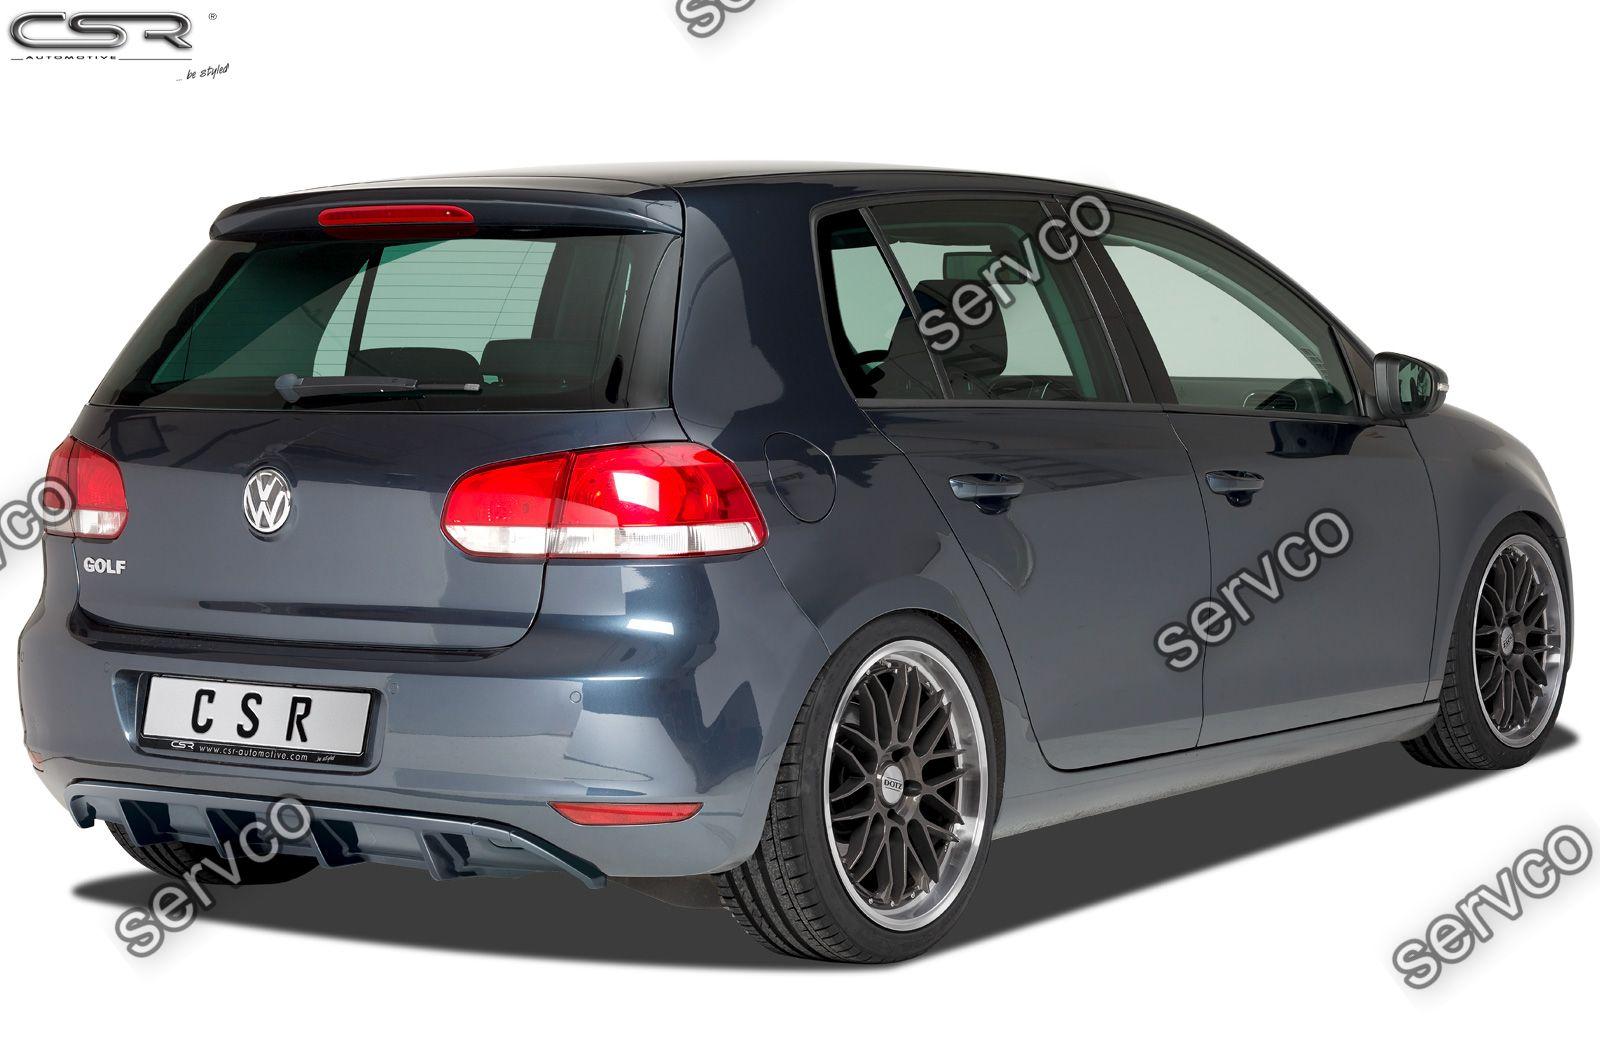 Prelungire difuzor tuning sport bara spate Volkswagen Golf 6 CSR HA220 2008-2012 v8